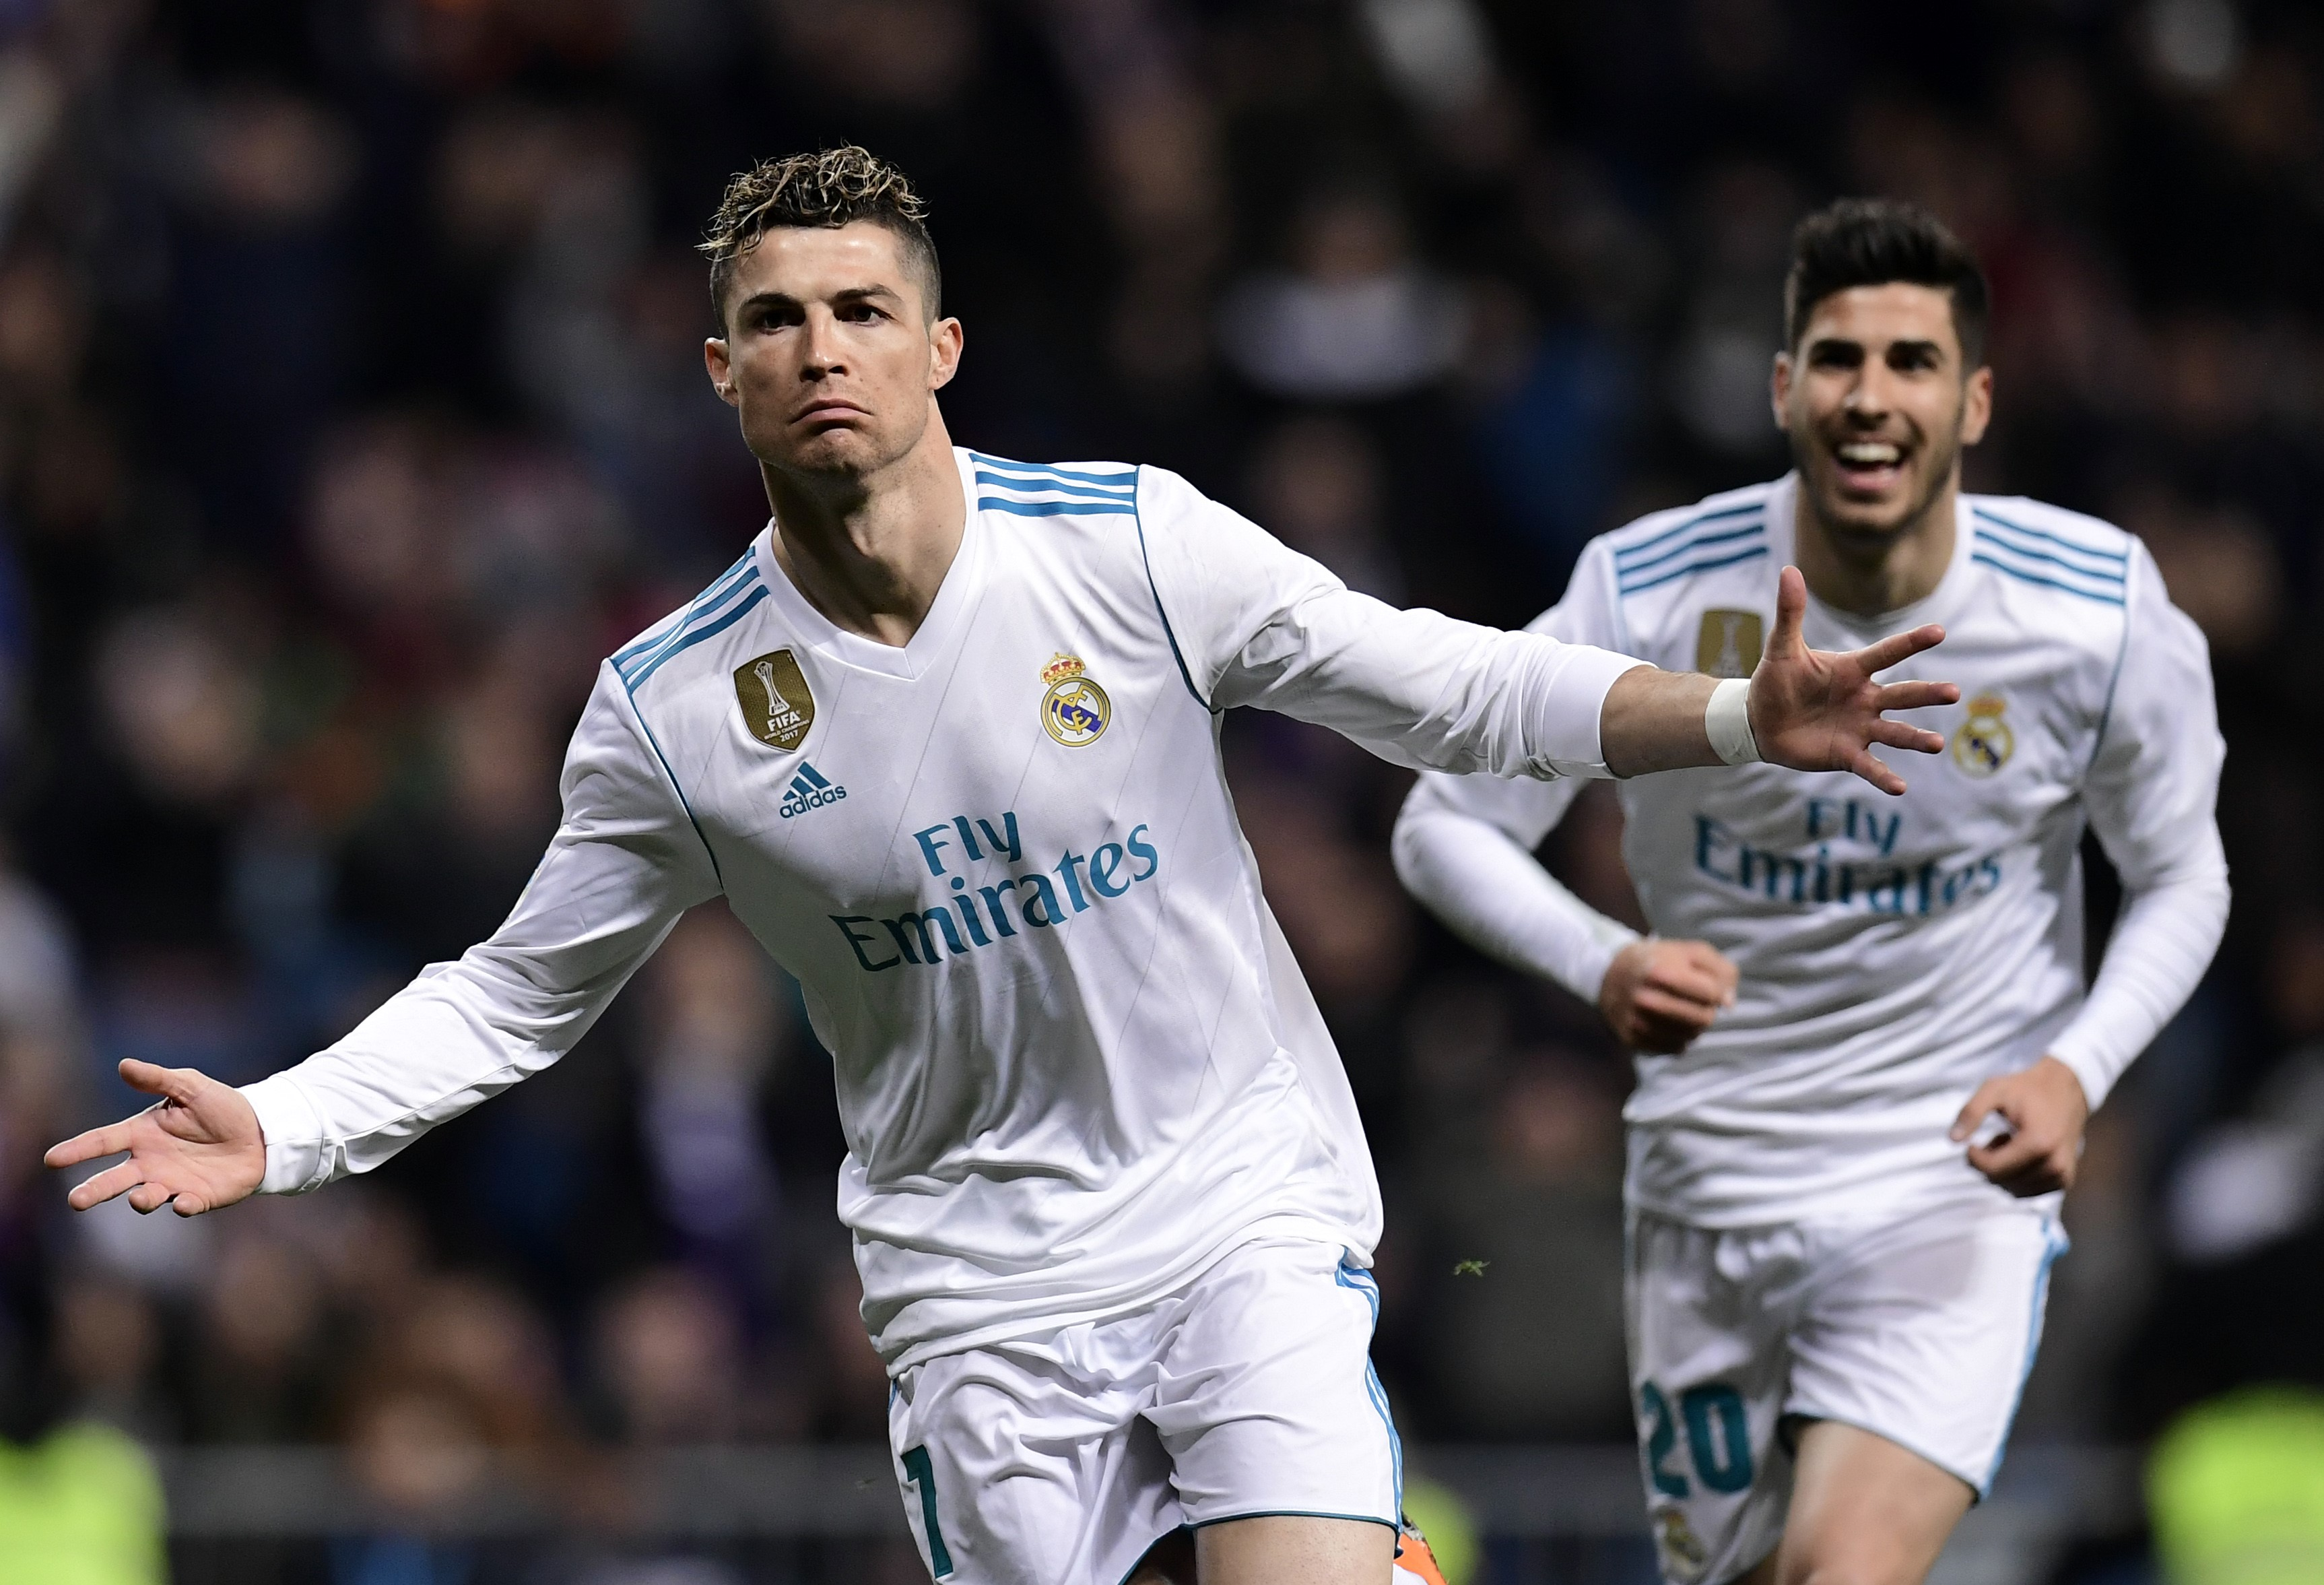 Криштиану Роналду («Реал» Мадрид), «Жирона»